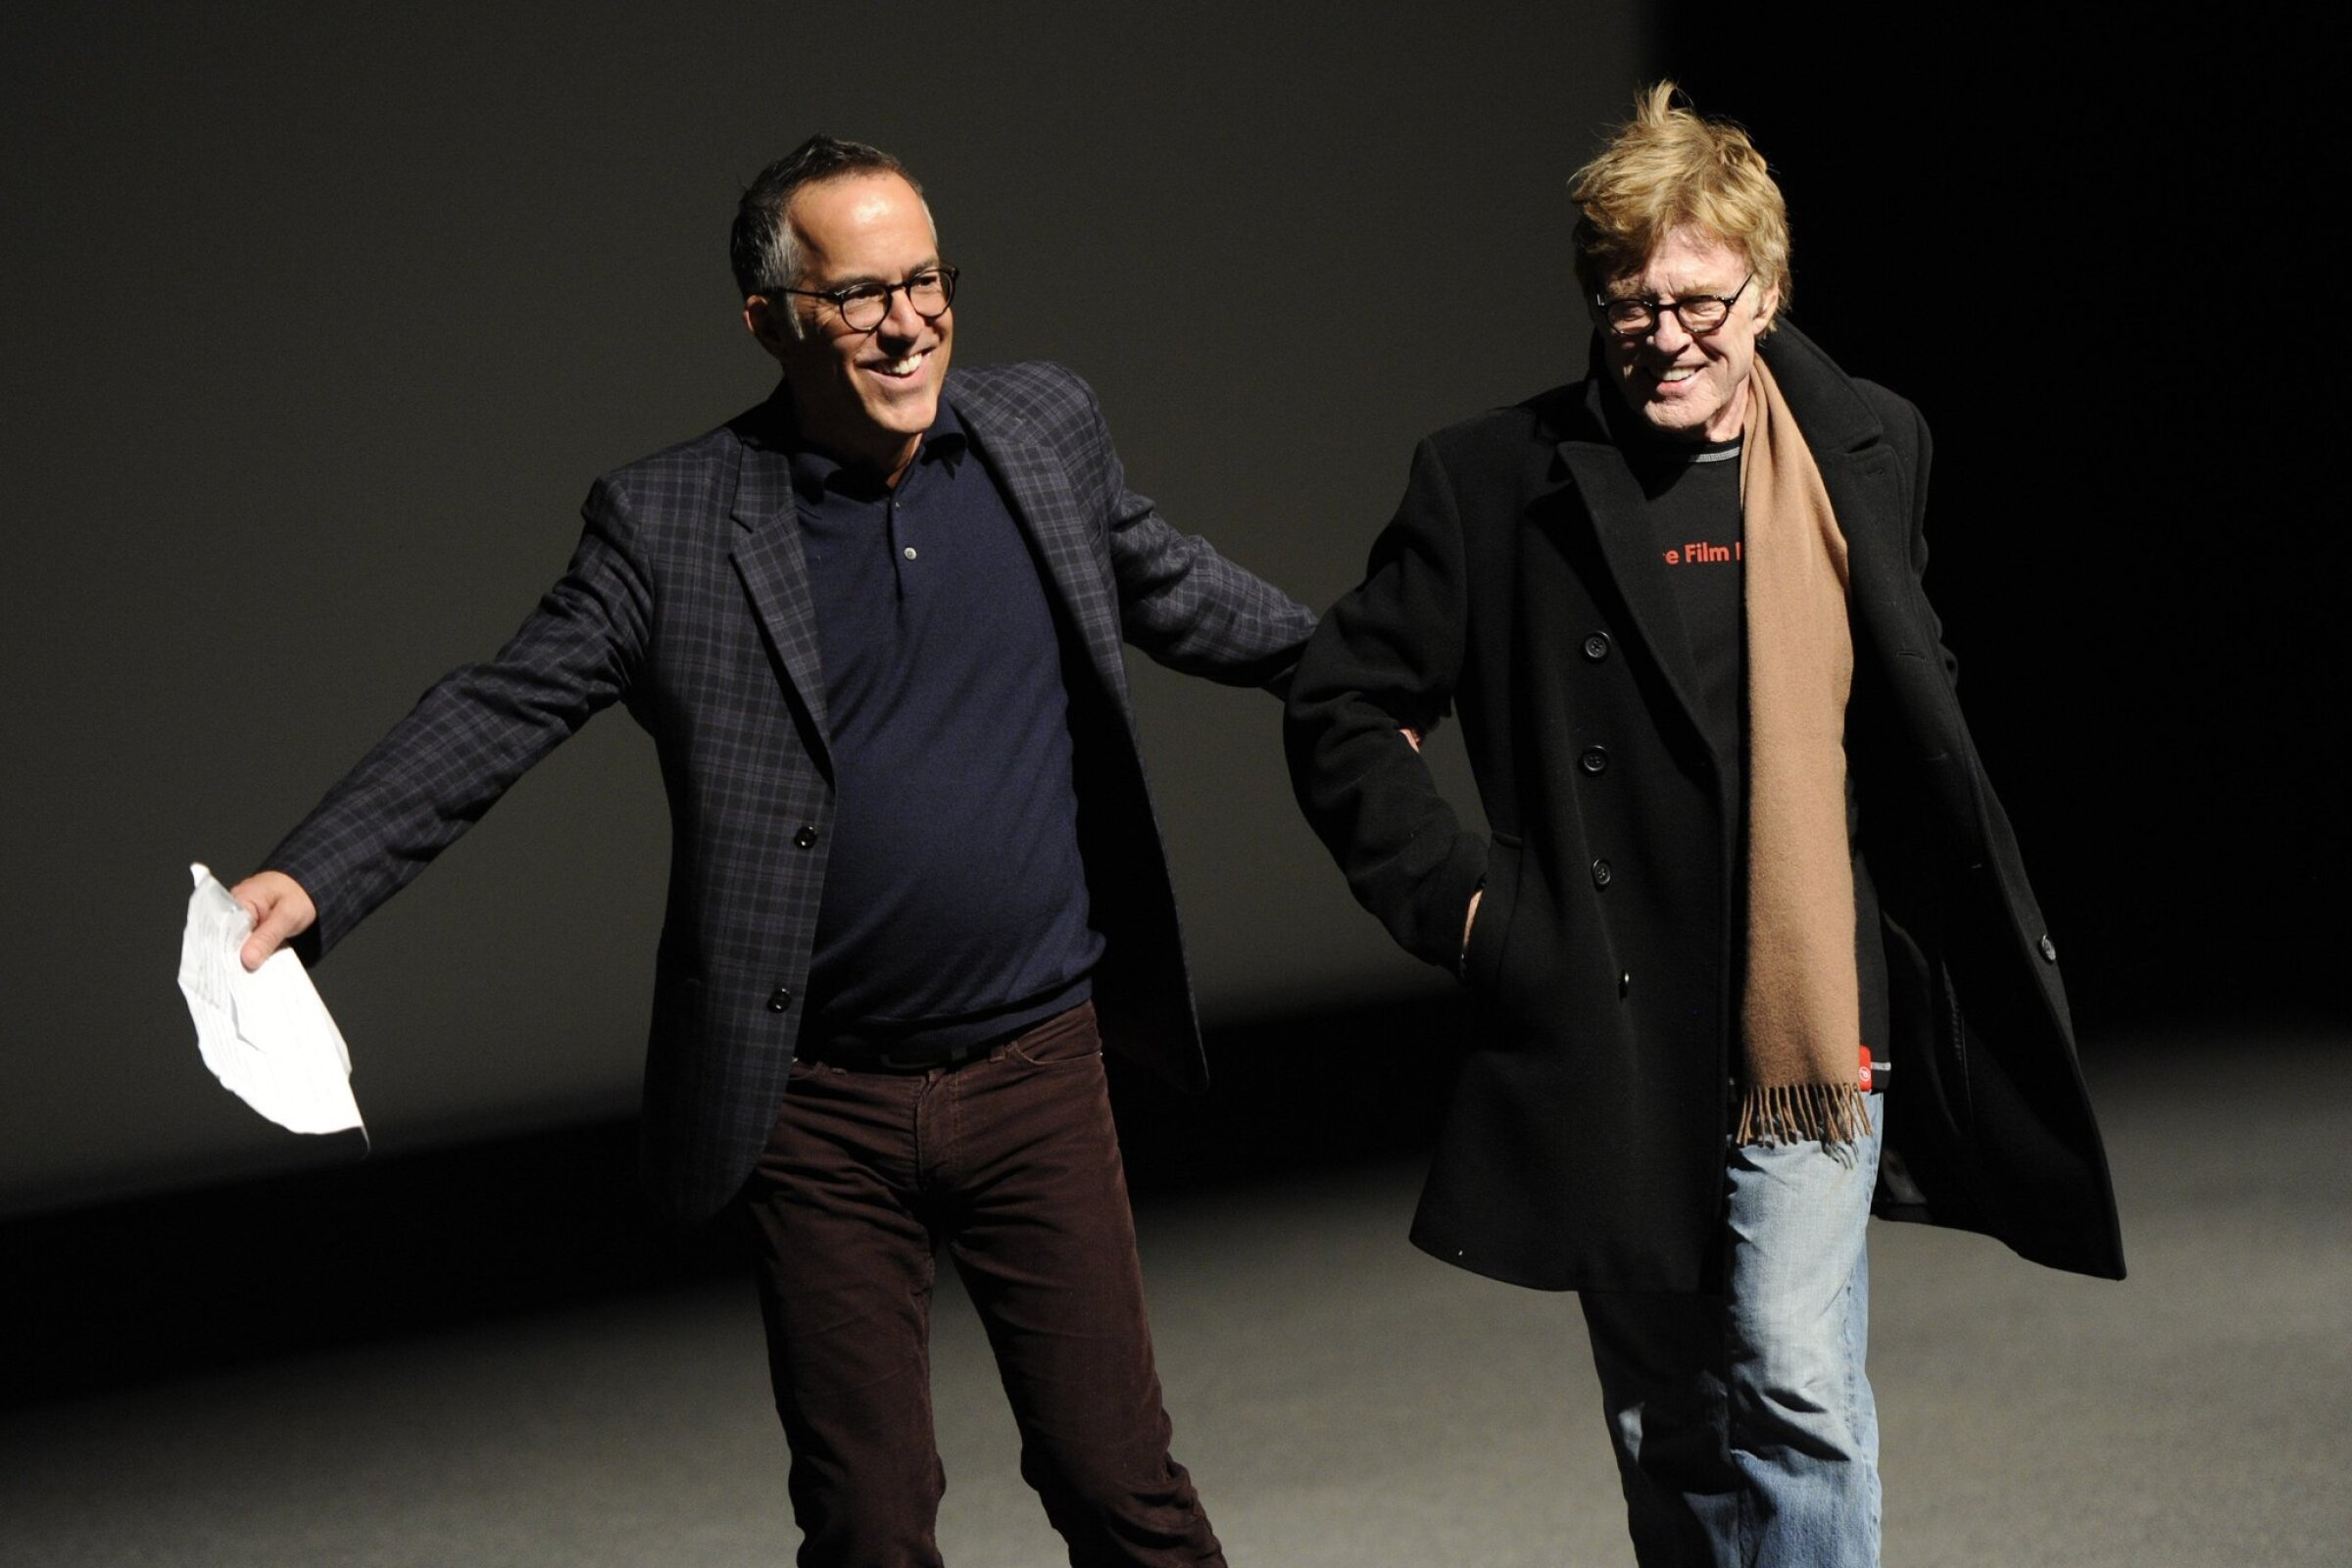 "John Cooper, left, director of programming for the Sundance Film Festival, leads Robert Redford, founder of the Sundance Institute, to the podium before the premiere of the documentary film ""What Happened, Miss Simone?"" at the 2015 Sundance Film Festival."